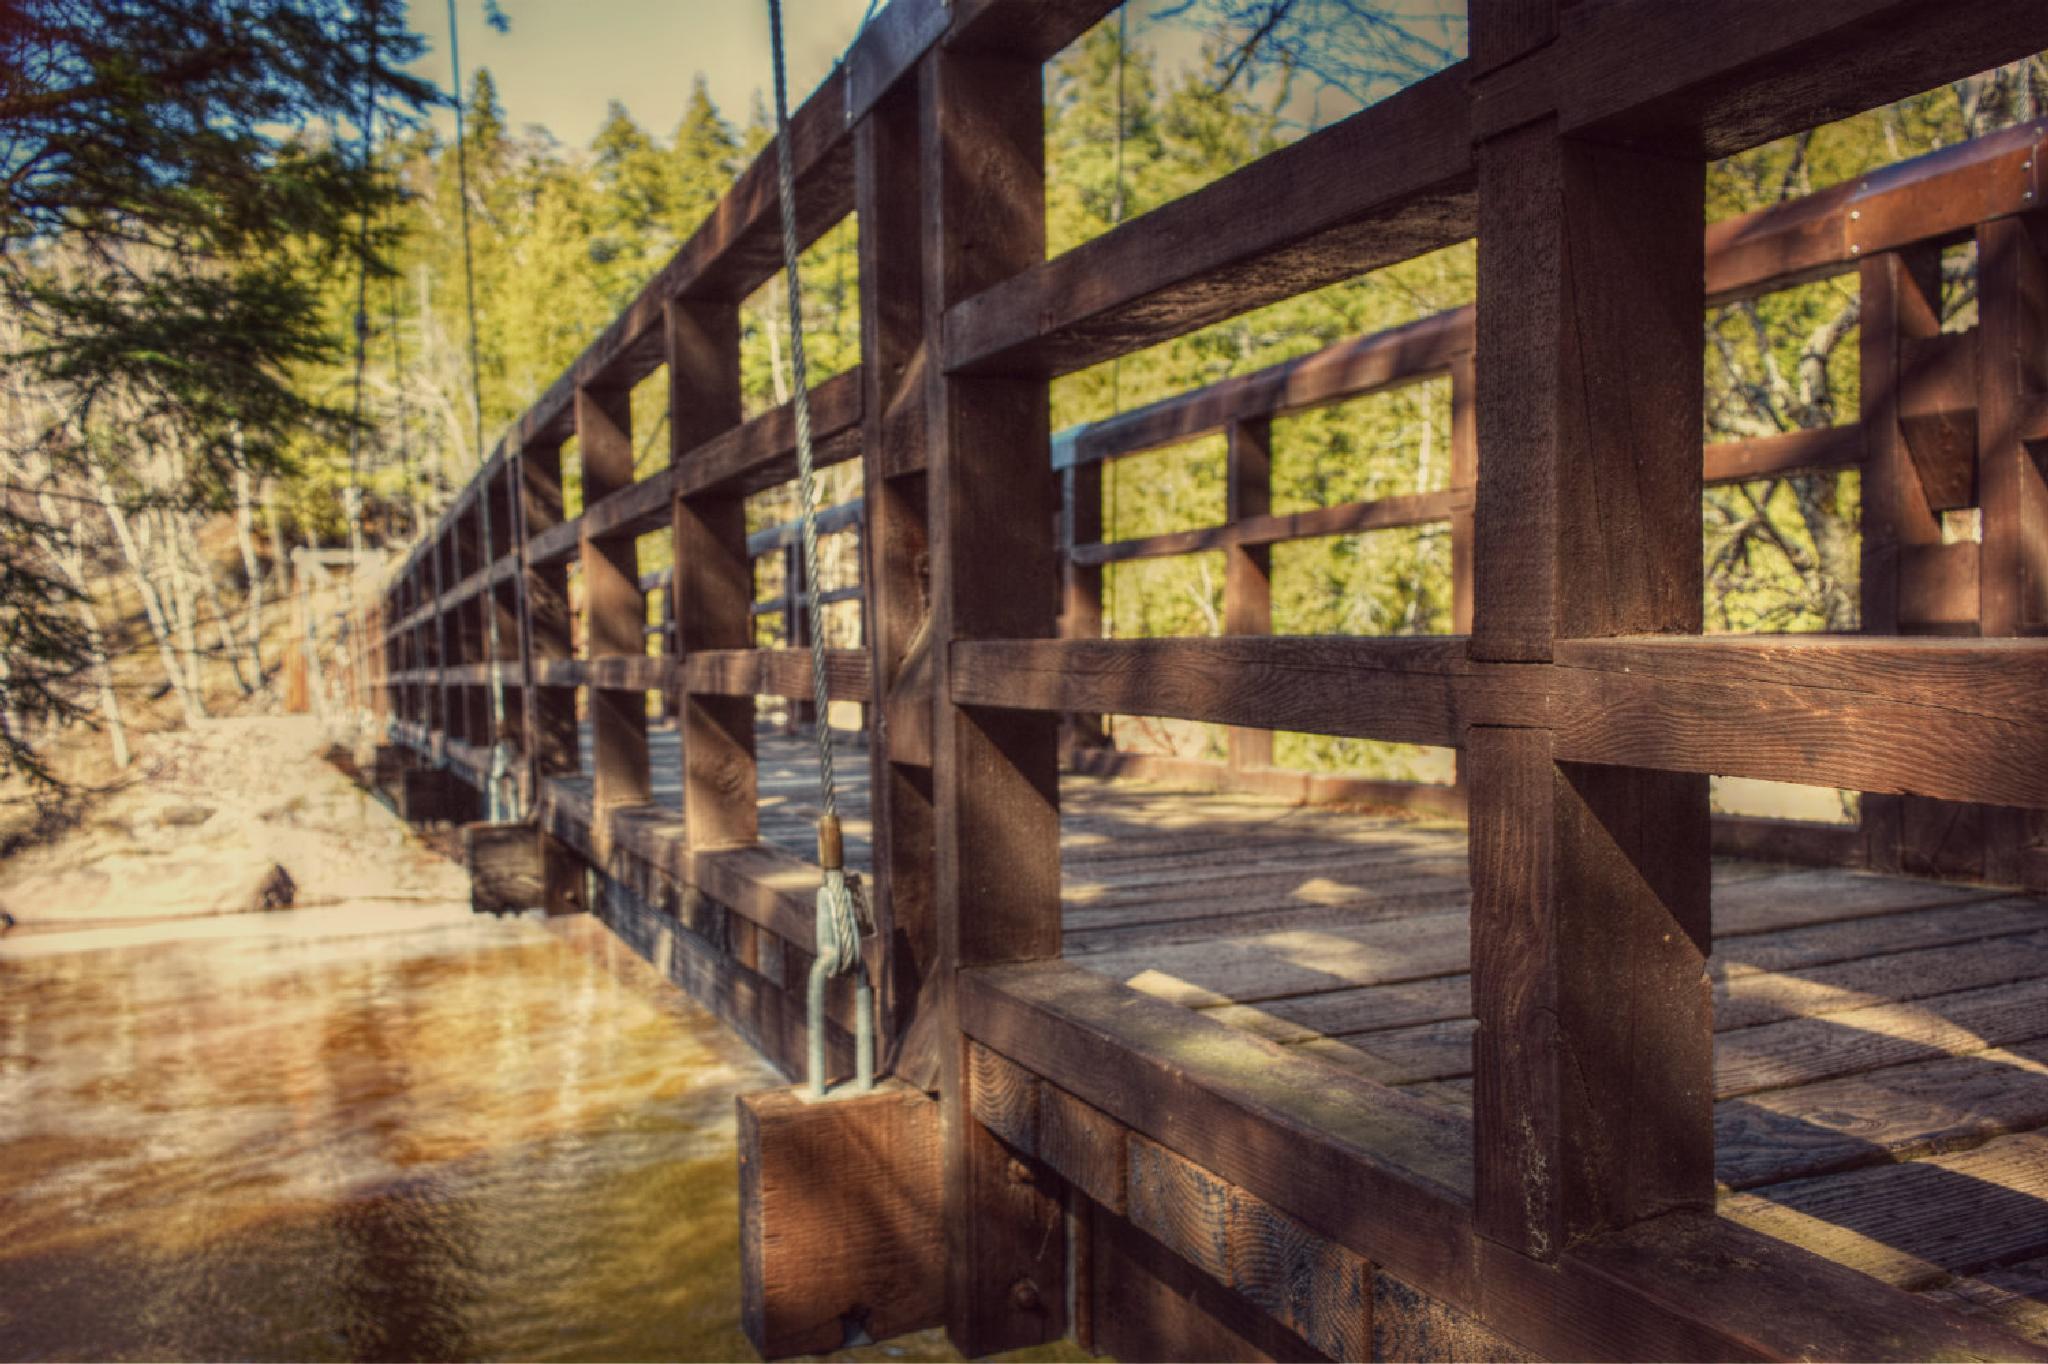 Footbridge by Nichole Petranek